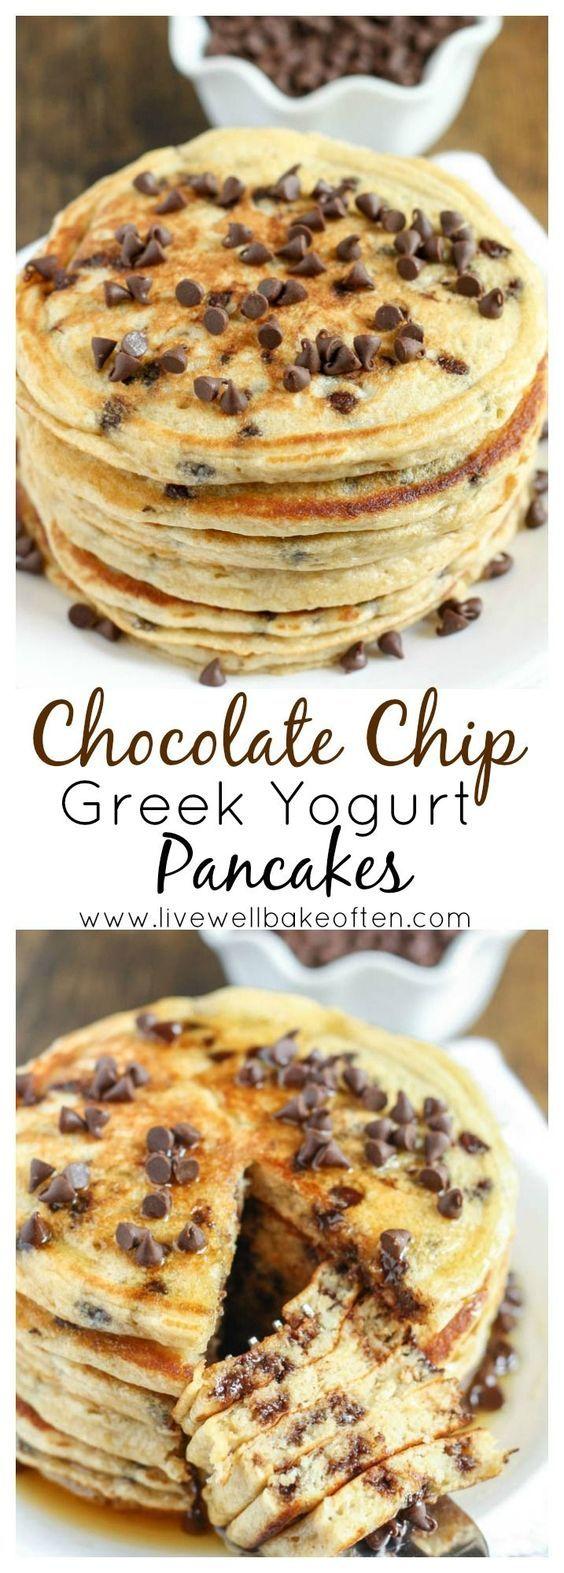 Chocolate Chip Greek Yogurt Pancakes #breakfast #american #chocolate #yogurt #pancakes